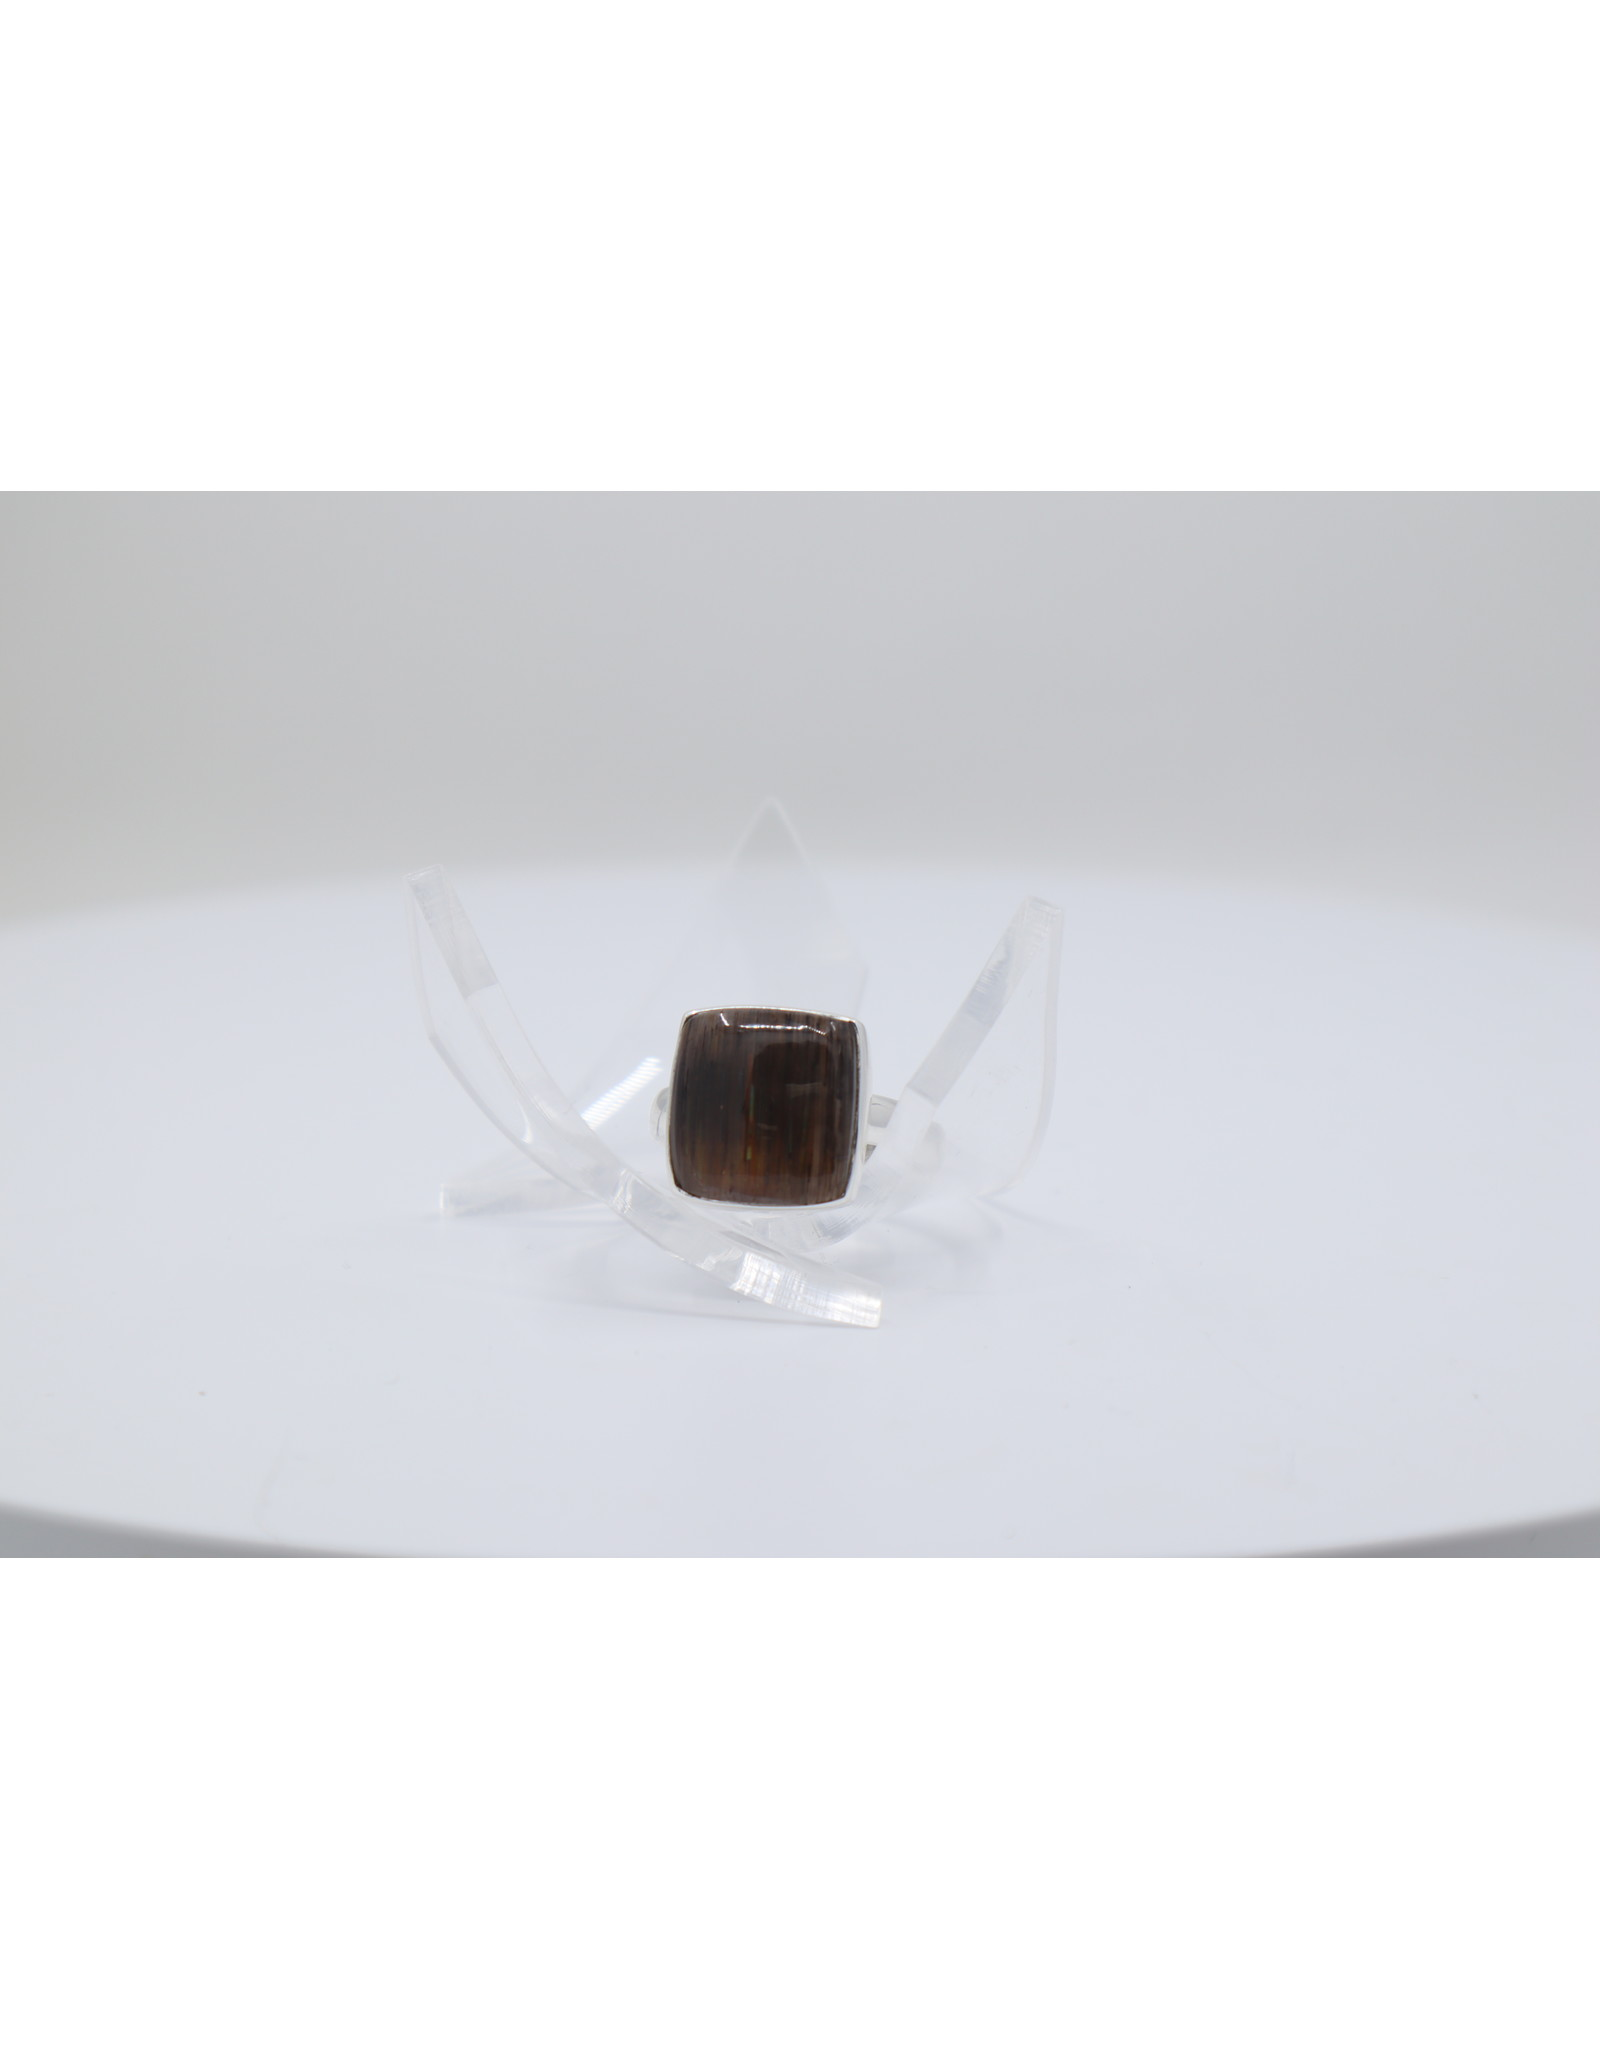 Black Sunstone Ring - Size 9